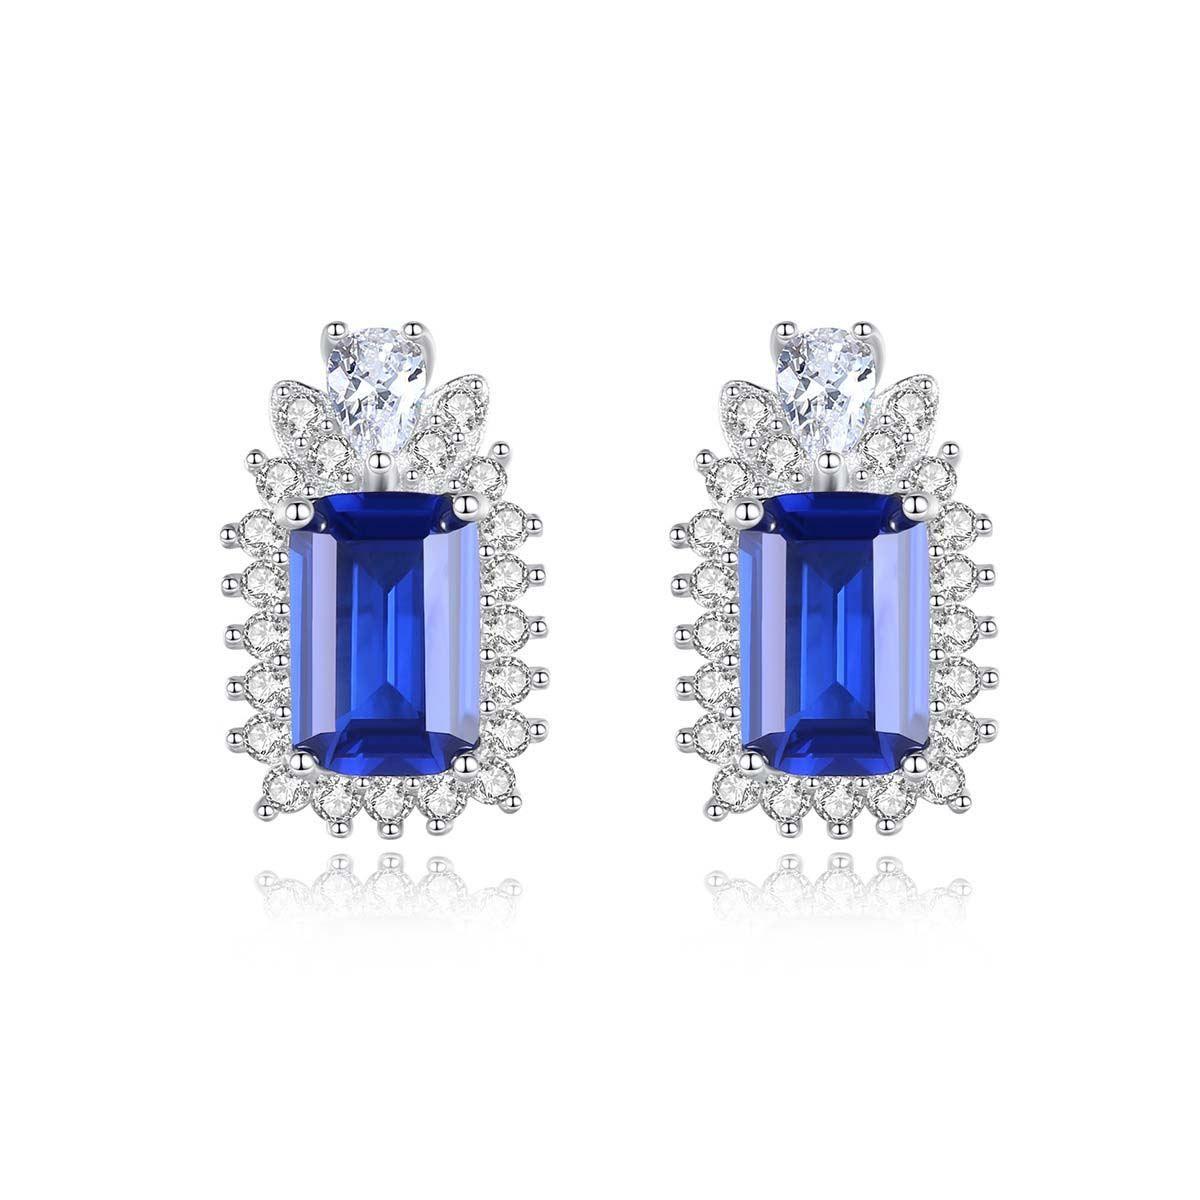 Elegant Blue Earrings in